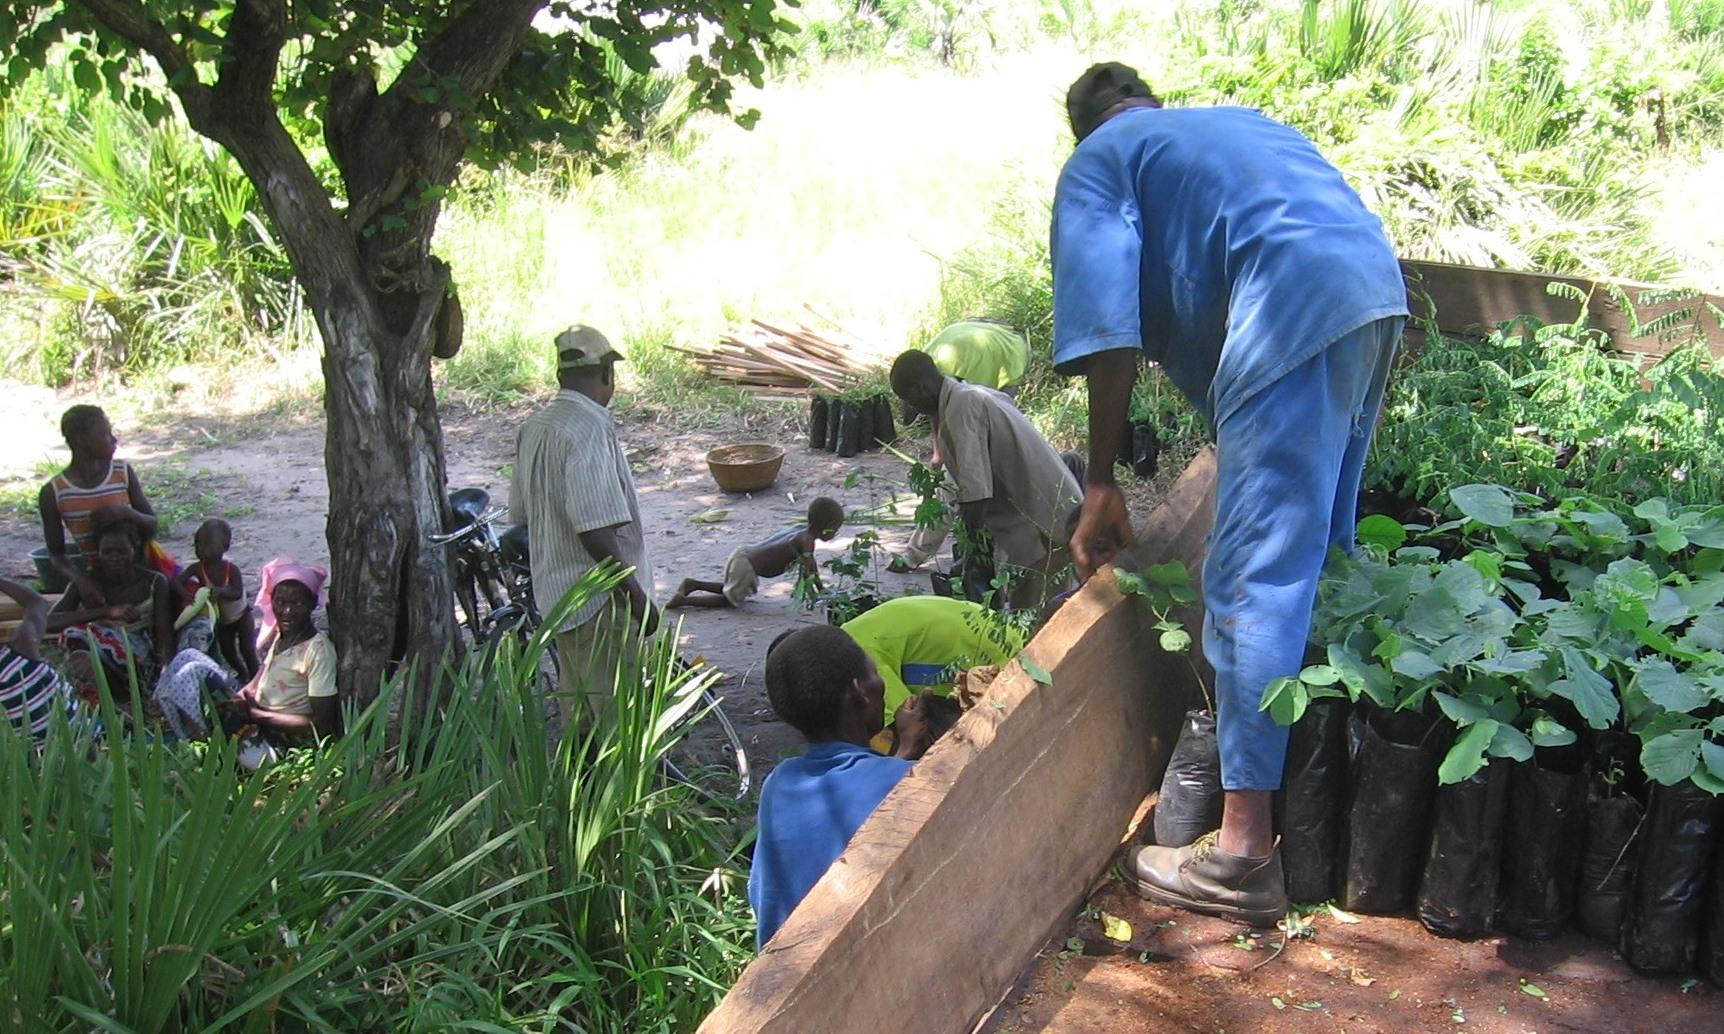 Entrega de árvores à comunidade  - Delivering trees to the community